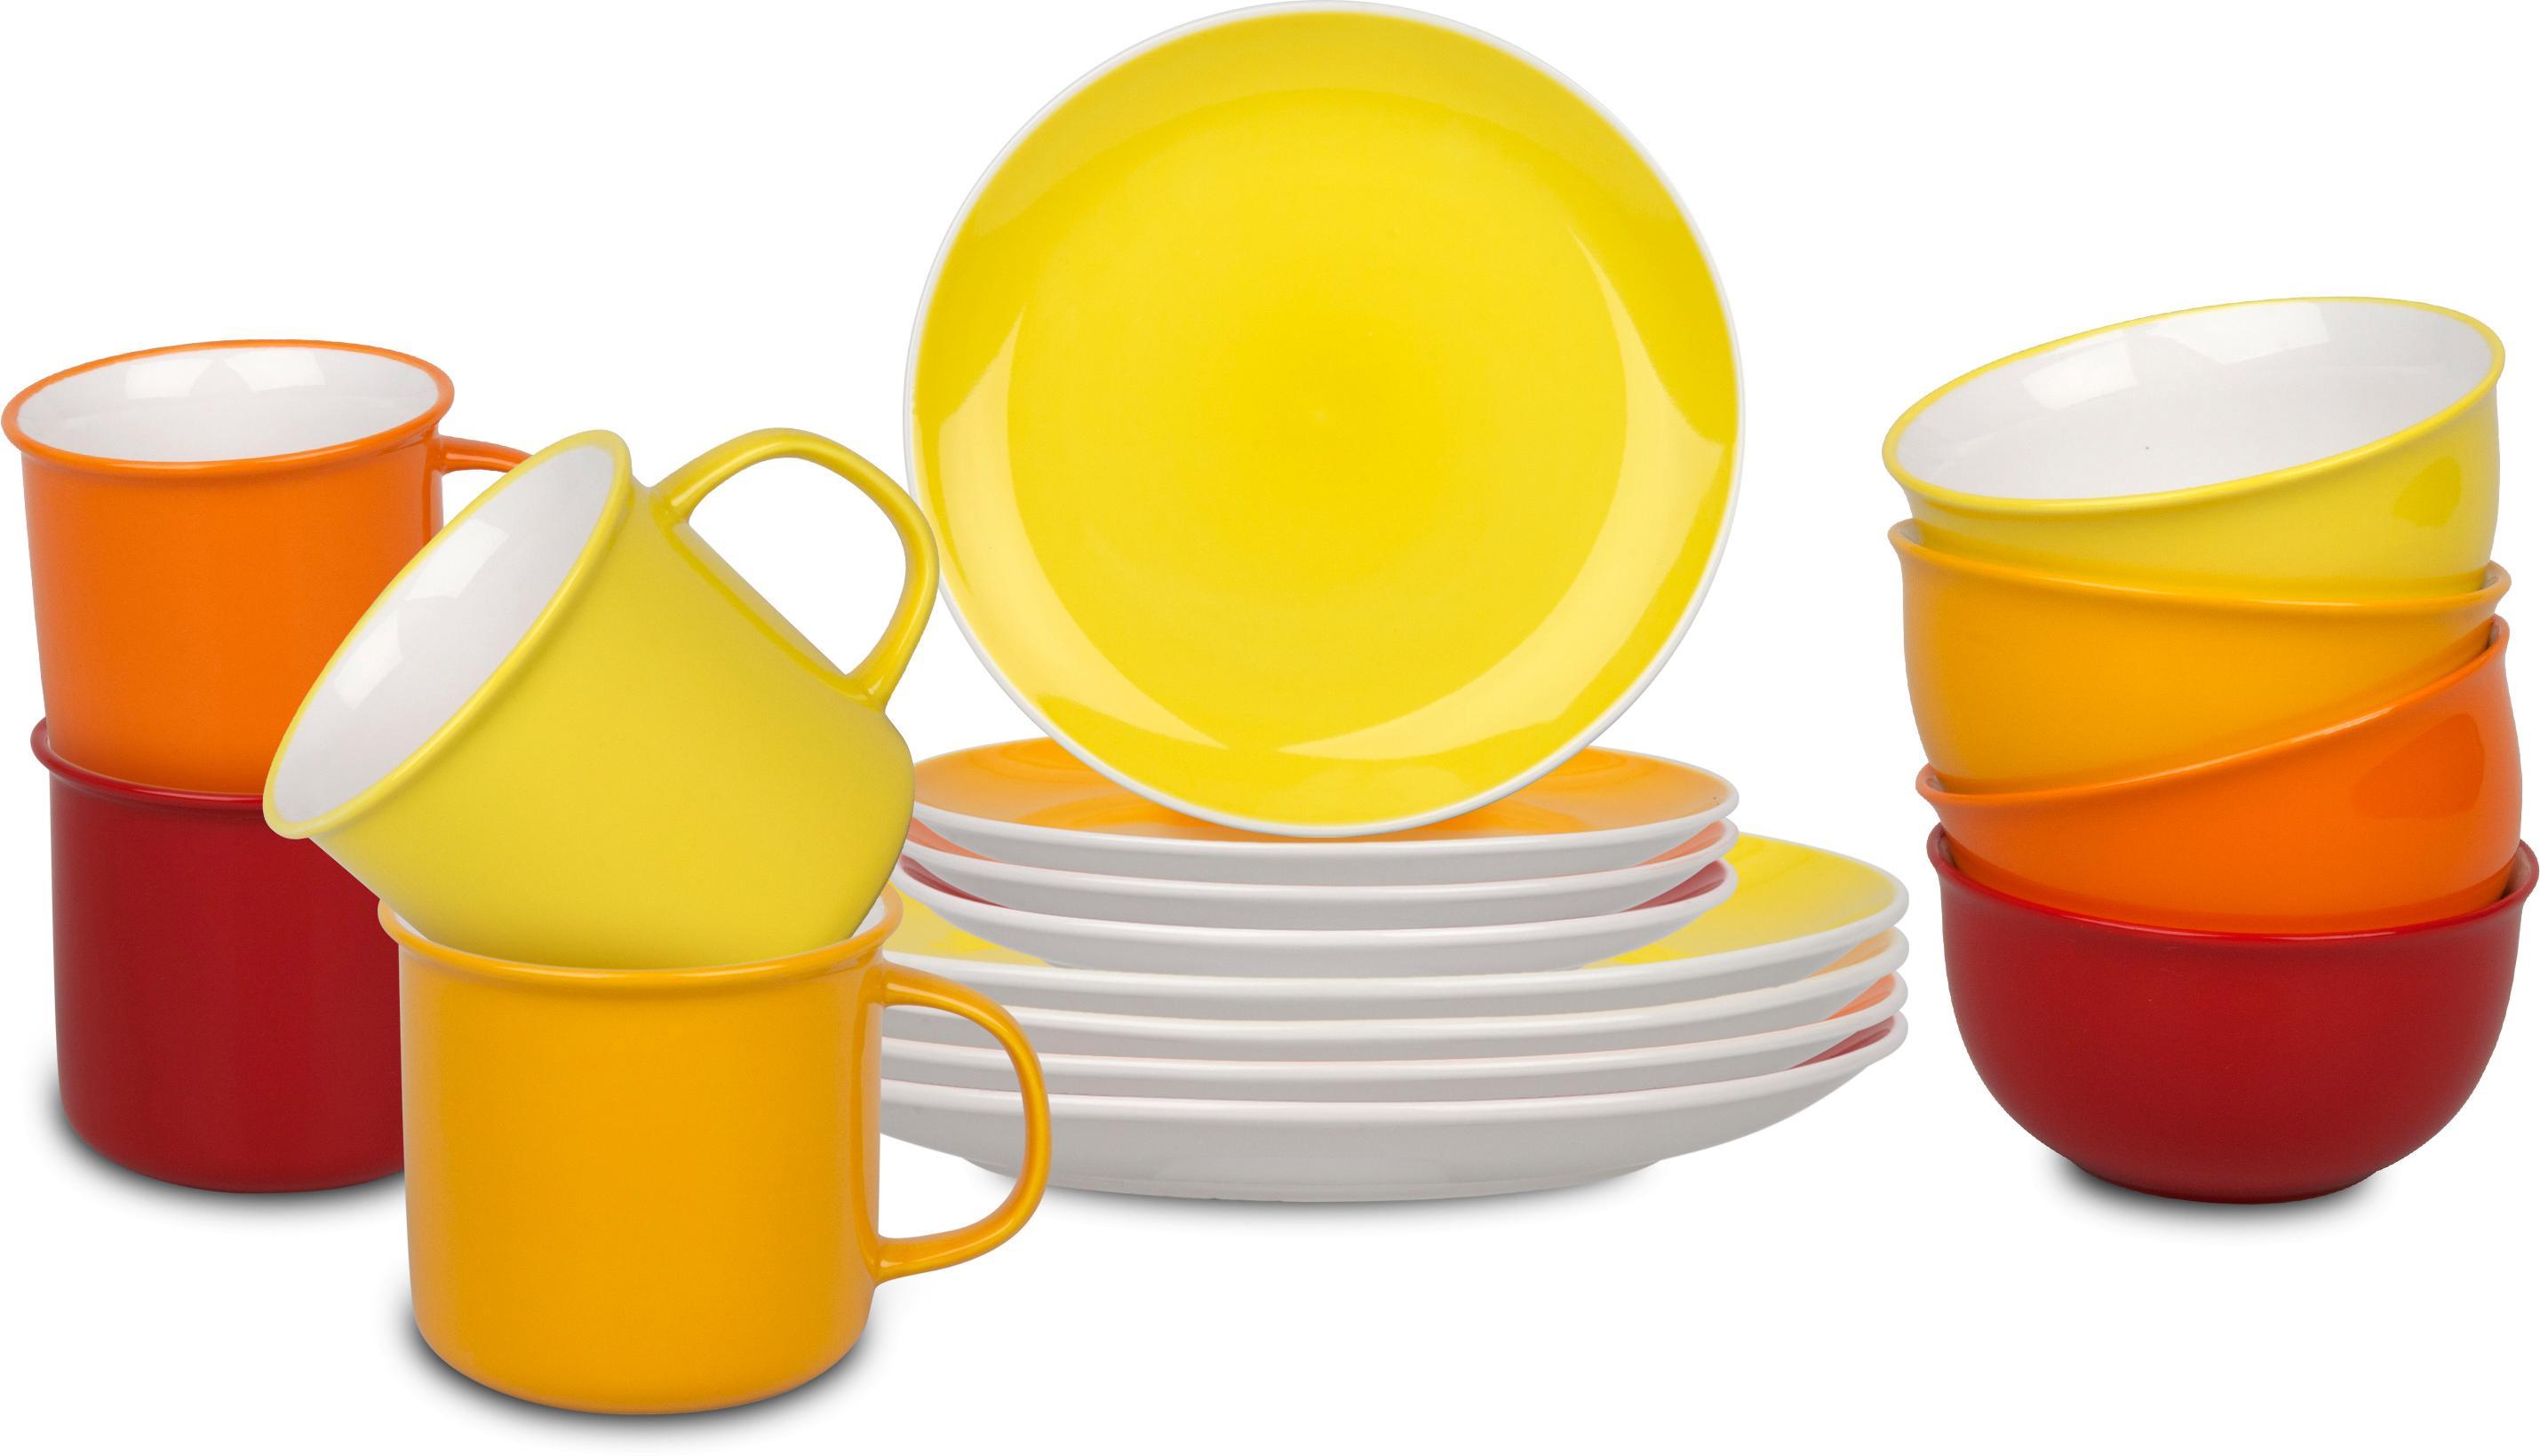 Könitz Kombiservice Elements, (Set, 16 tlg.), handdekoriert gelb Geschirr-Sets Geschirr, Porzellan Tischaccessoires Haushaltswaren